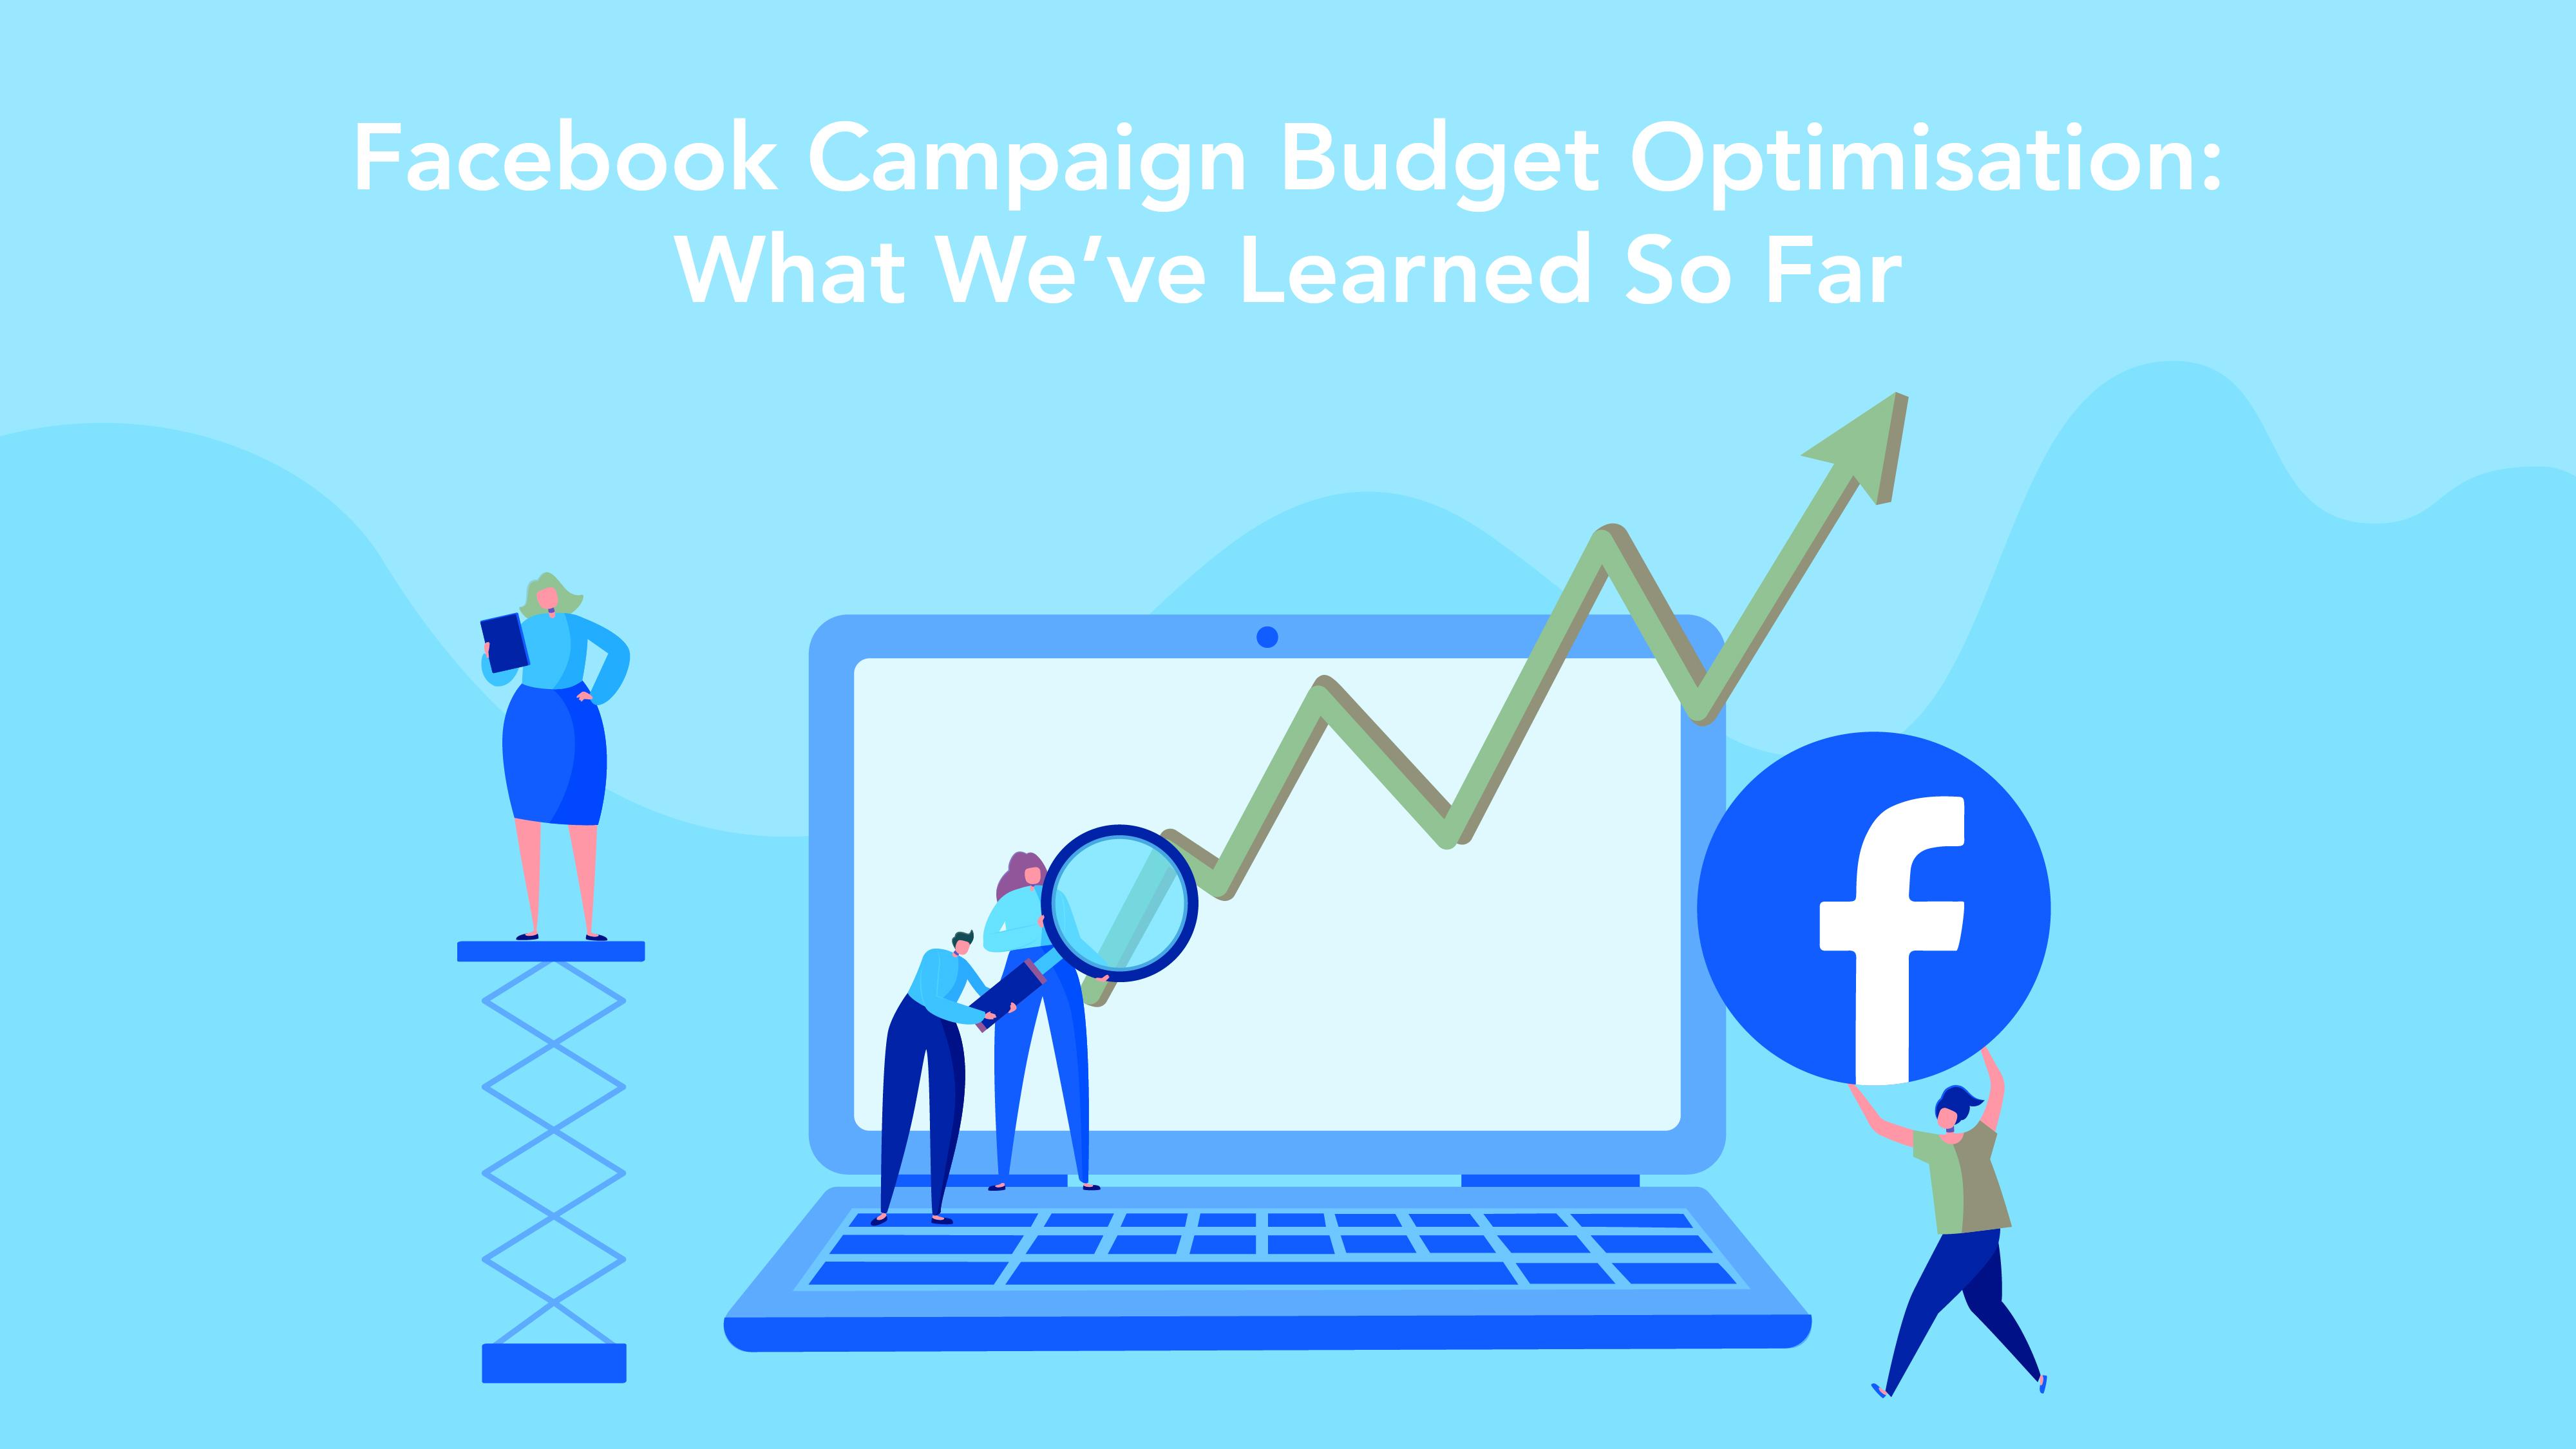 Facebook Campaign Budget Optimisation: What We've Learned So Far